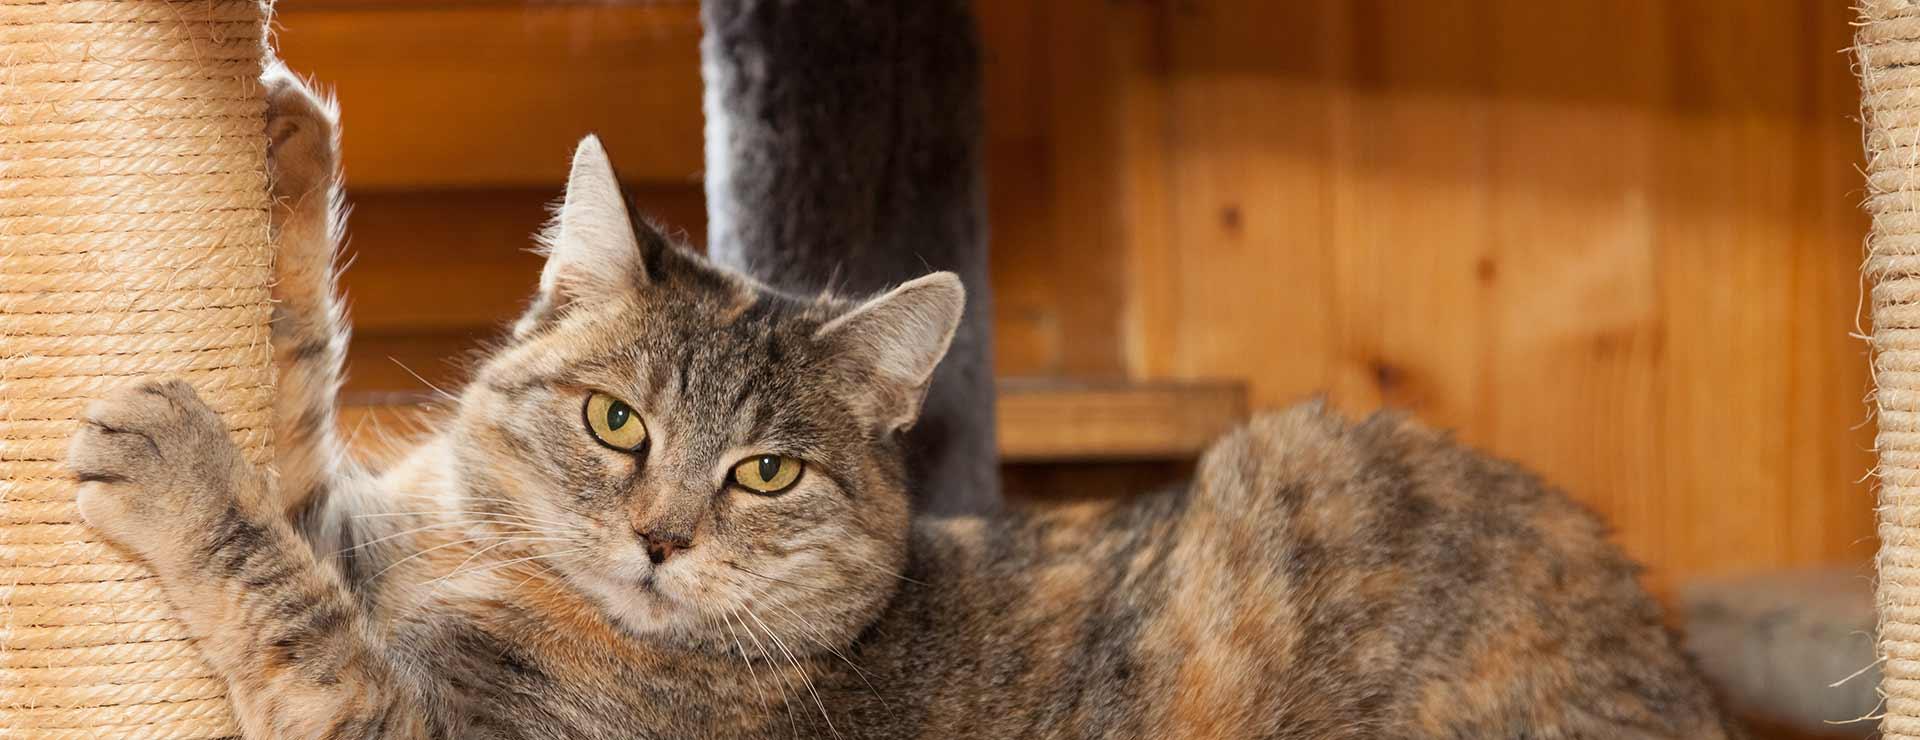 Cat Scratch Disease Johns Hopkins Medicine